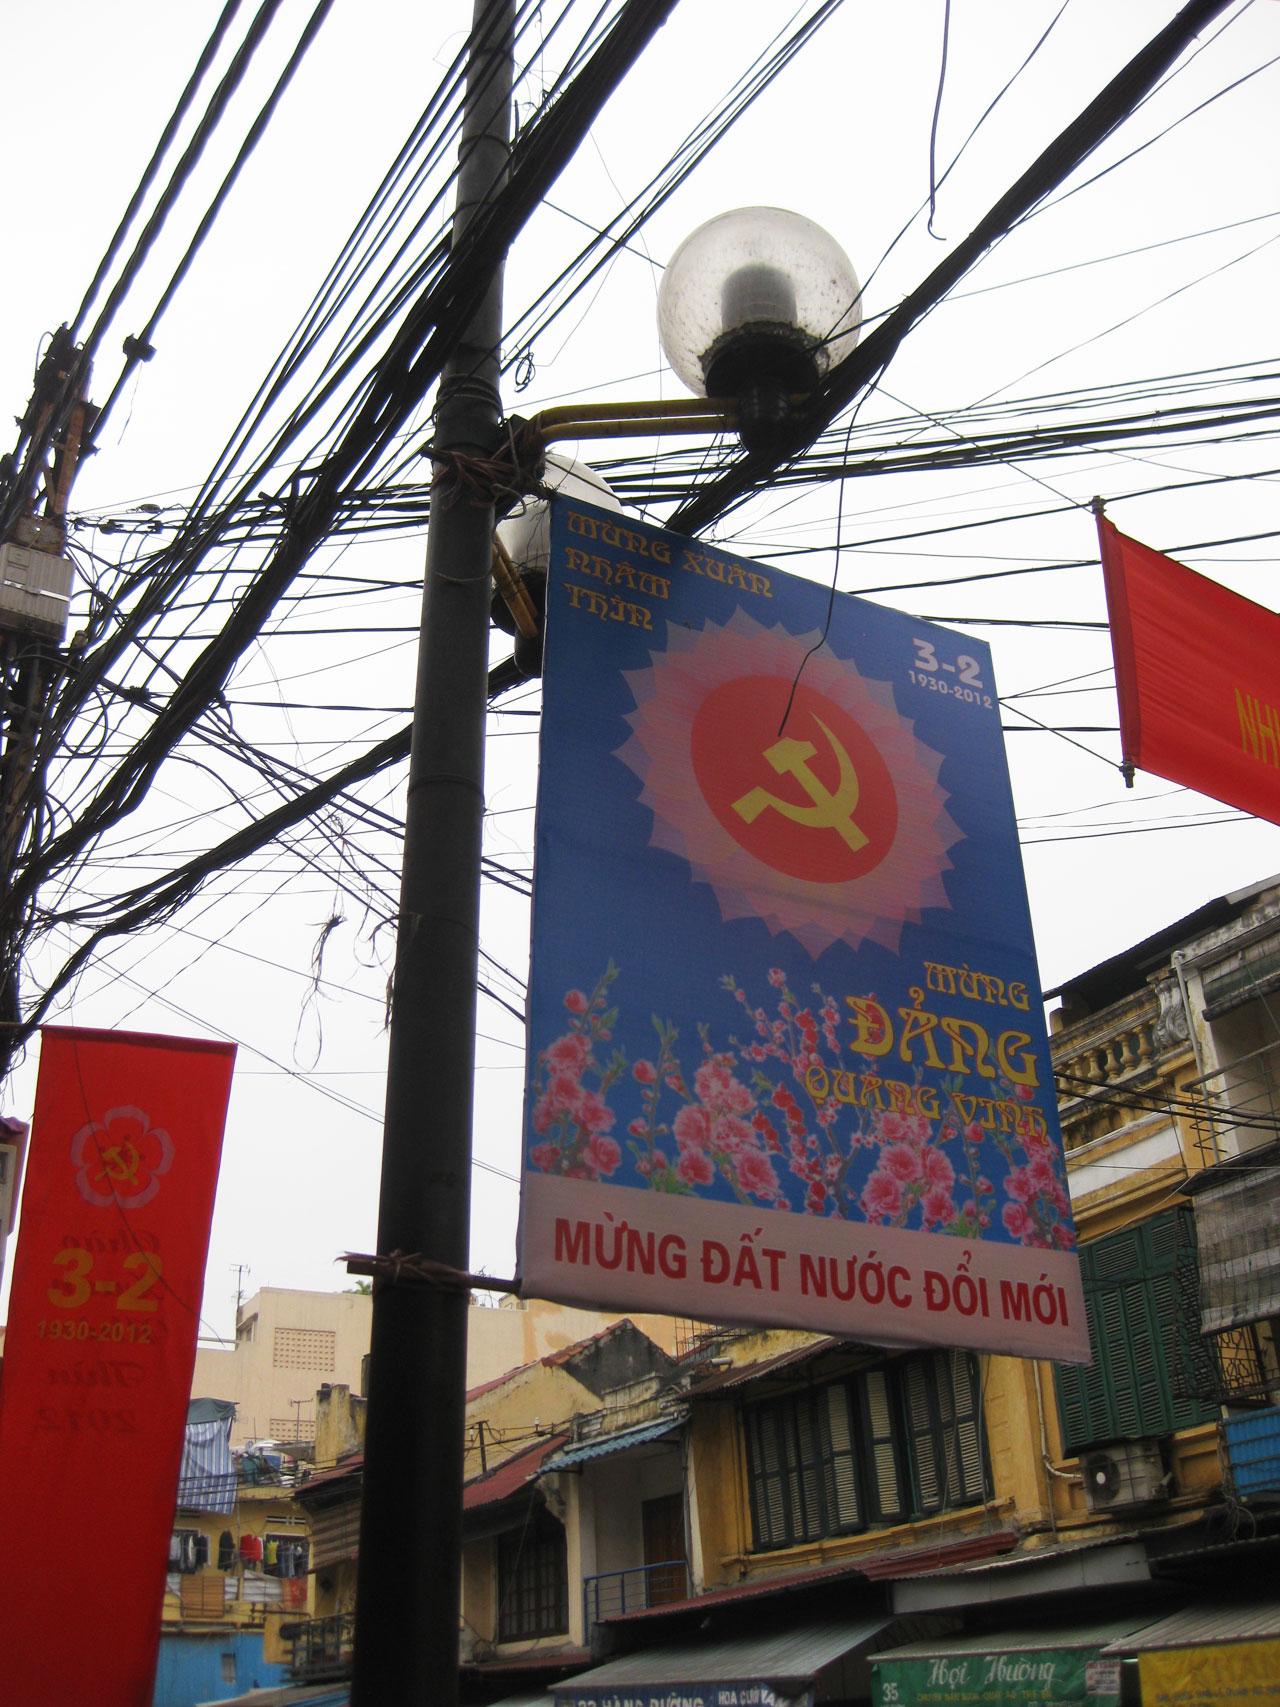 Dodgy wiring and communist propaganda in Hanoi's Old Quarter, Vietnam